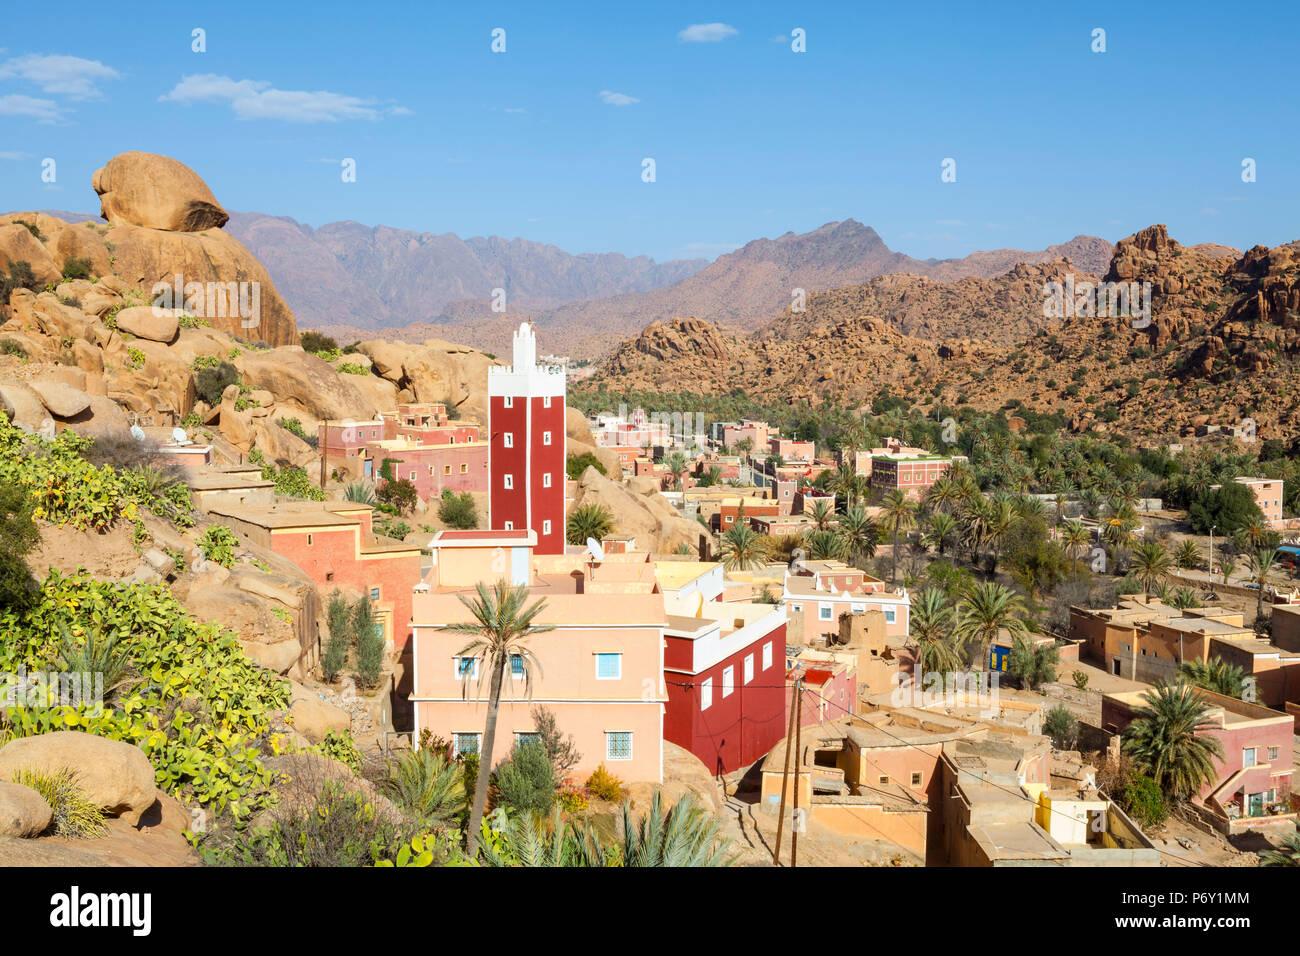 Vista elevada sobre la Mezquita Roja de Adai, Tafraoute, Anti Atlas, Marruecos Imagen De Stock